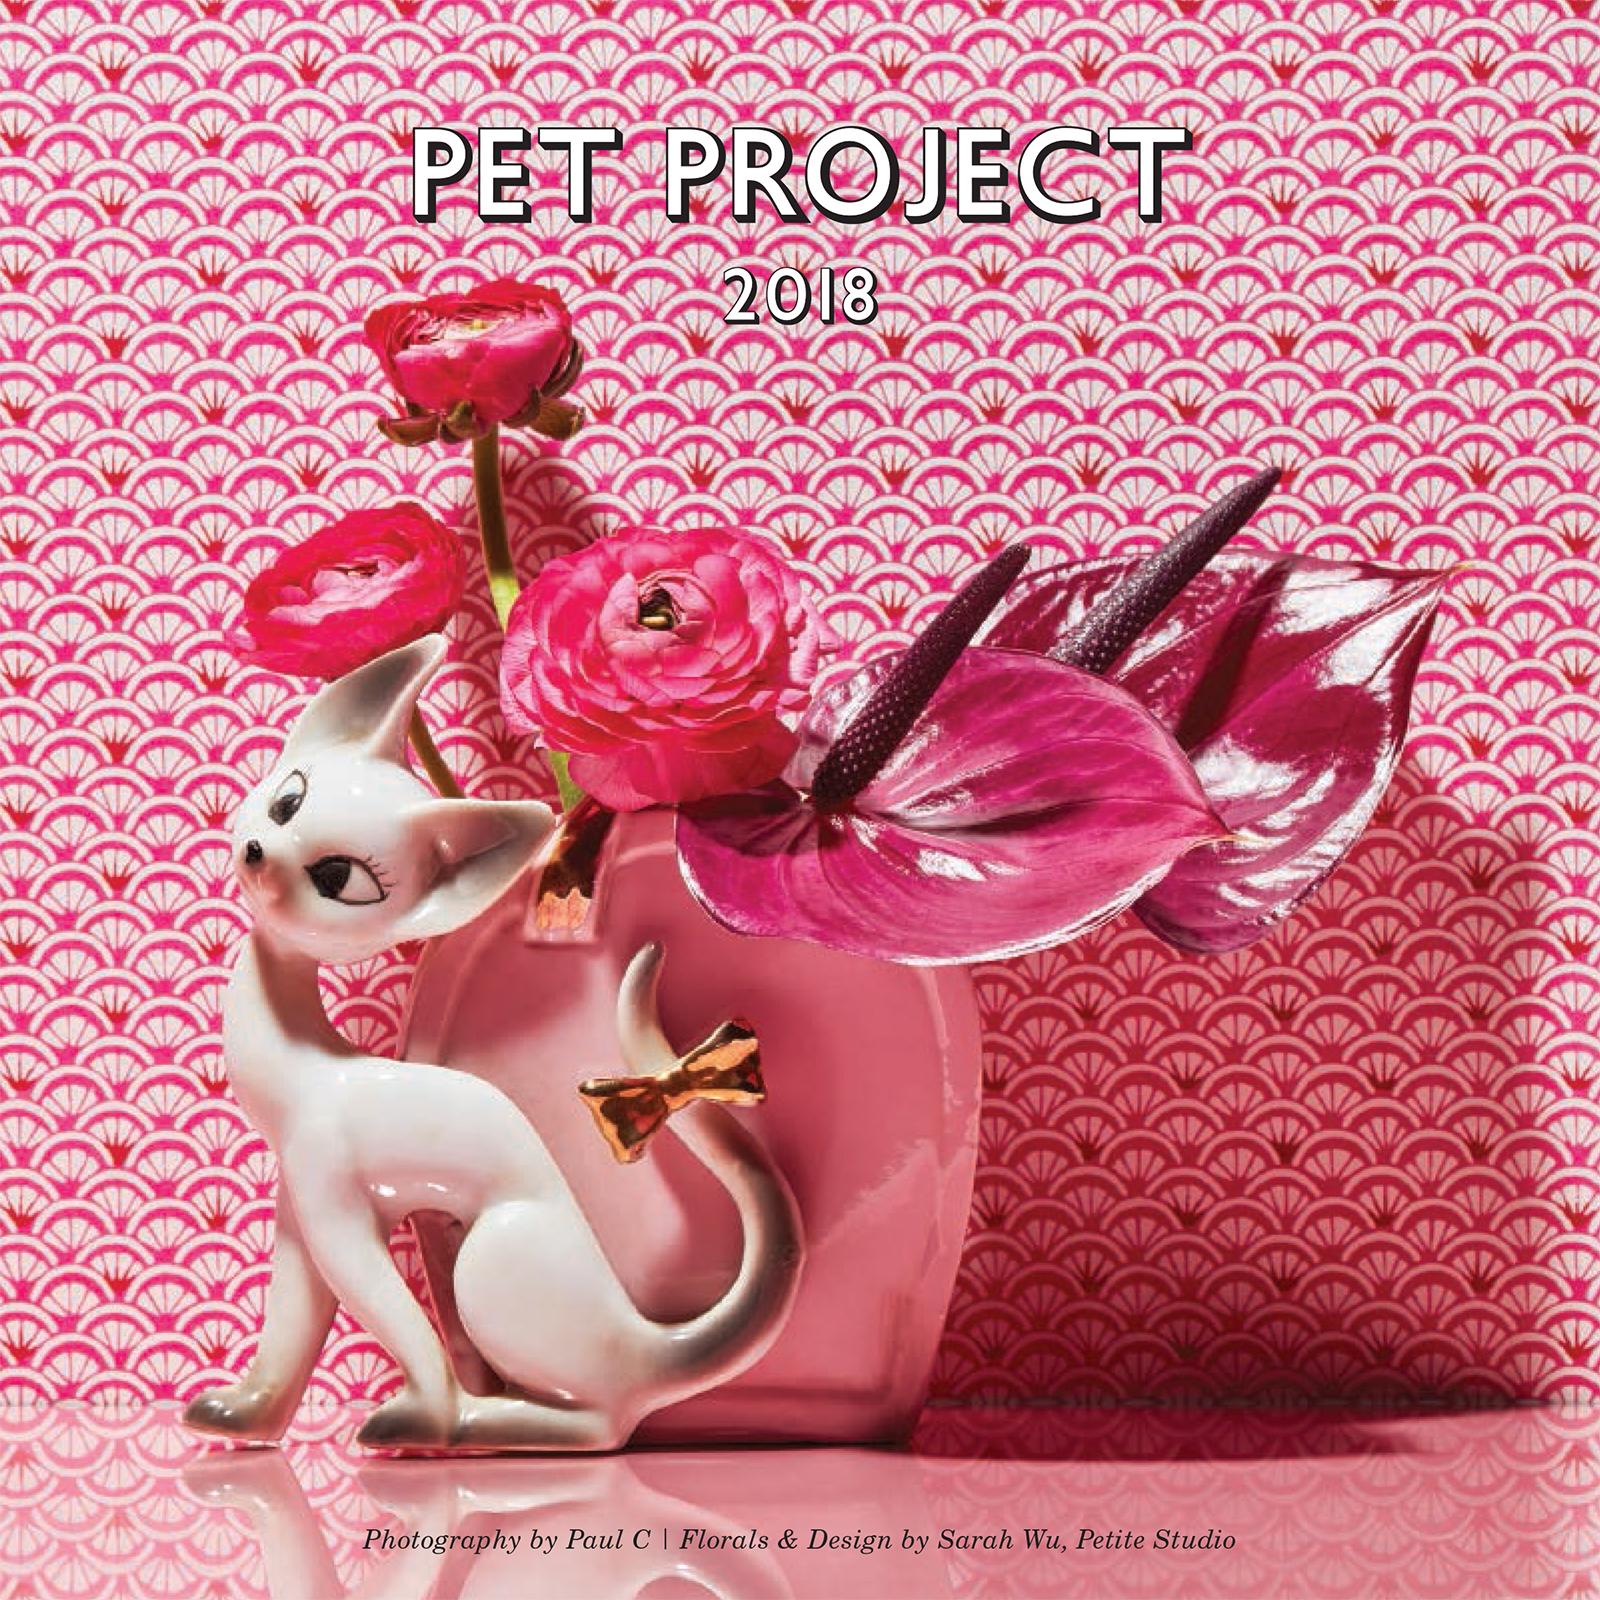 Pet Project. Calendar design collaboration with Paul C, 2018